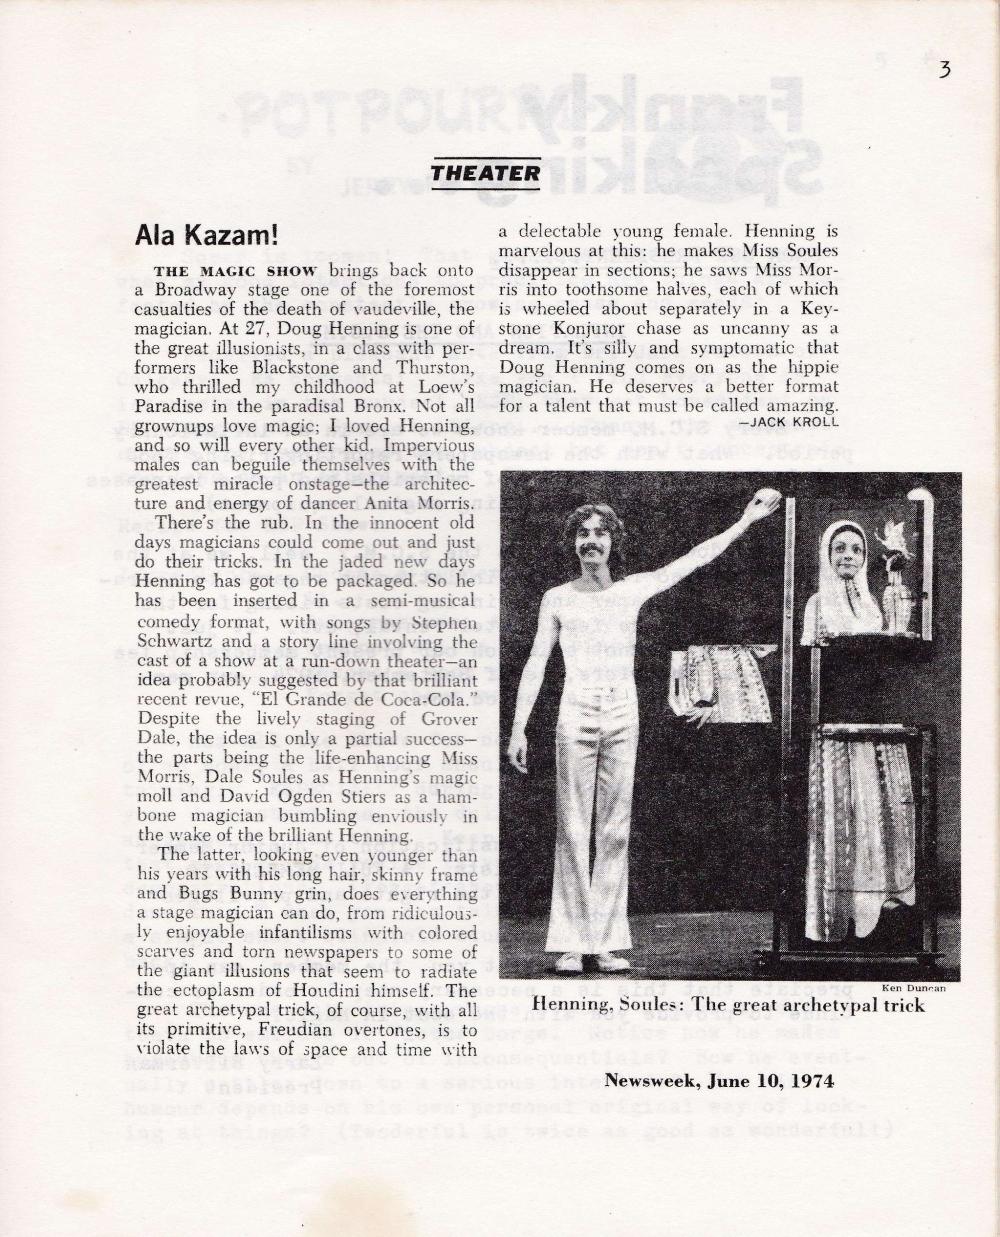 doug-henning-cam-magazine_page_4-e1520445335273.jpg